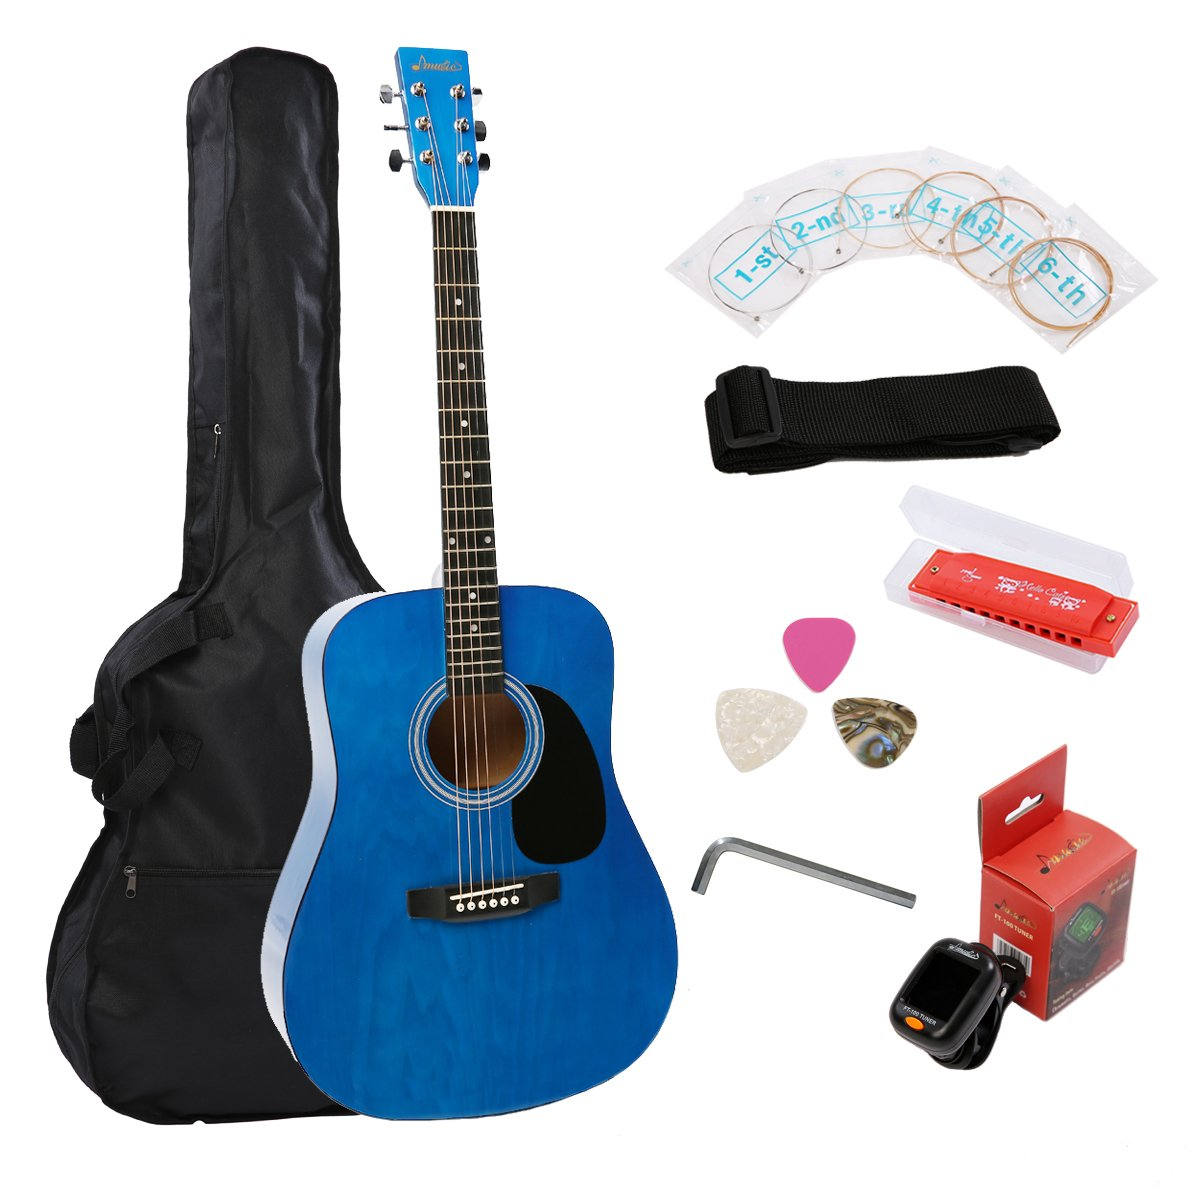 imusic 41 inch full size dreadnought 6 string beginner acoustic guitar ebay. Black Bedroom Furniture Sets. Home Design Ideas